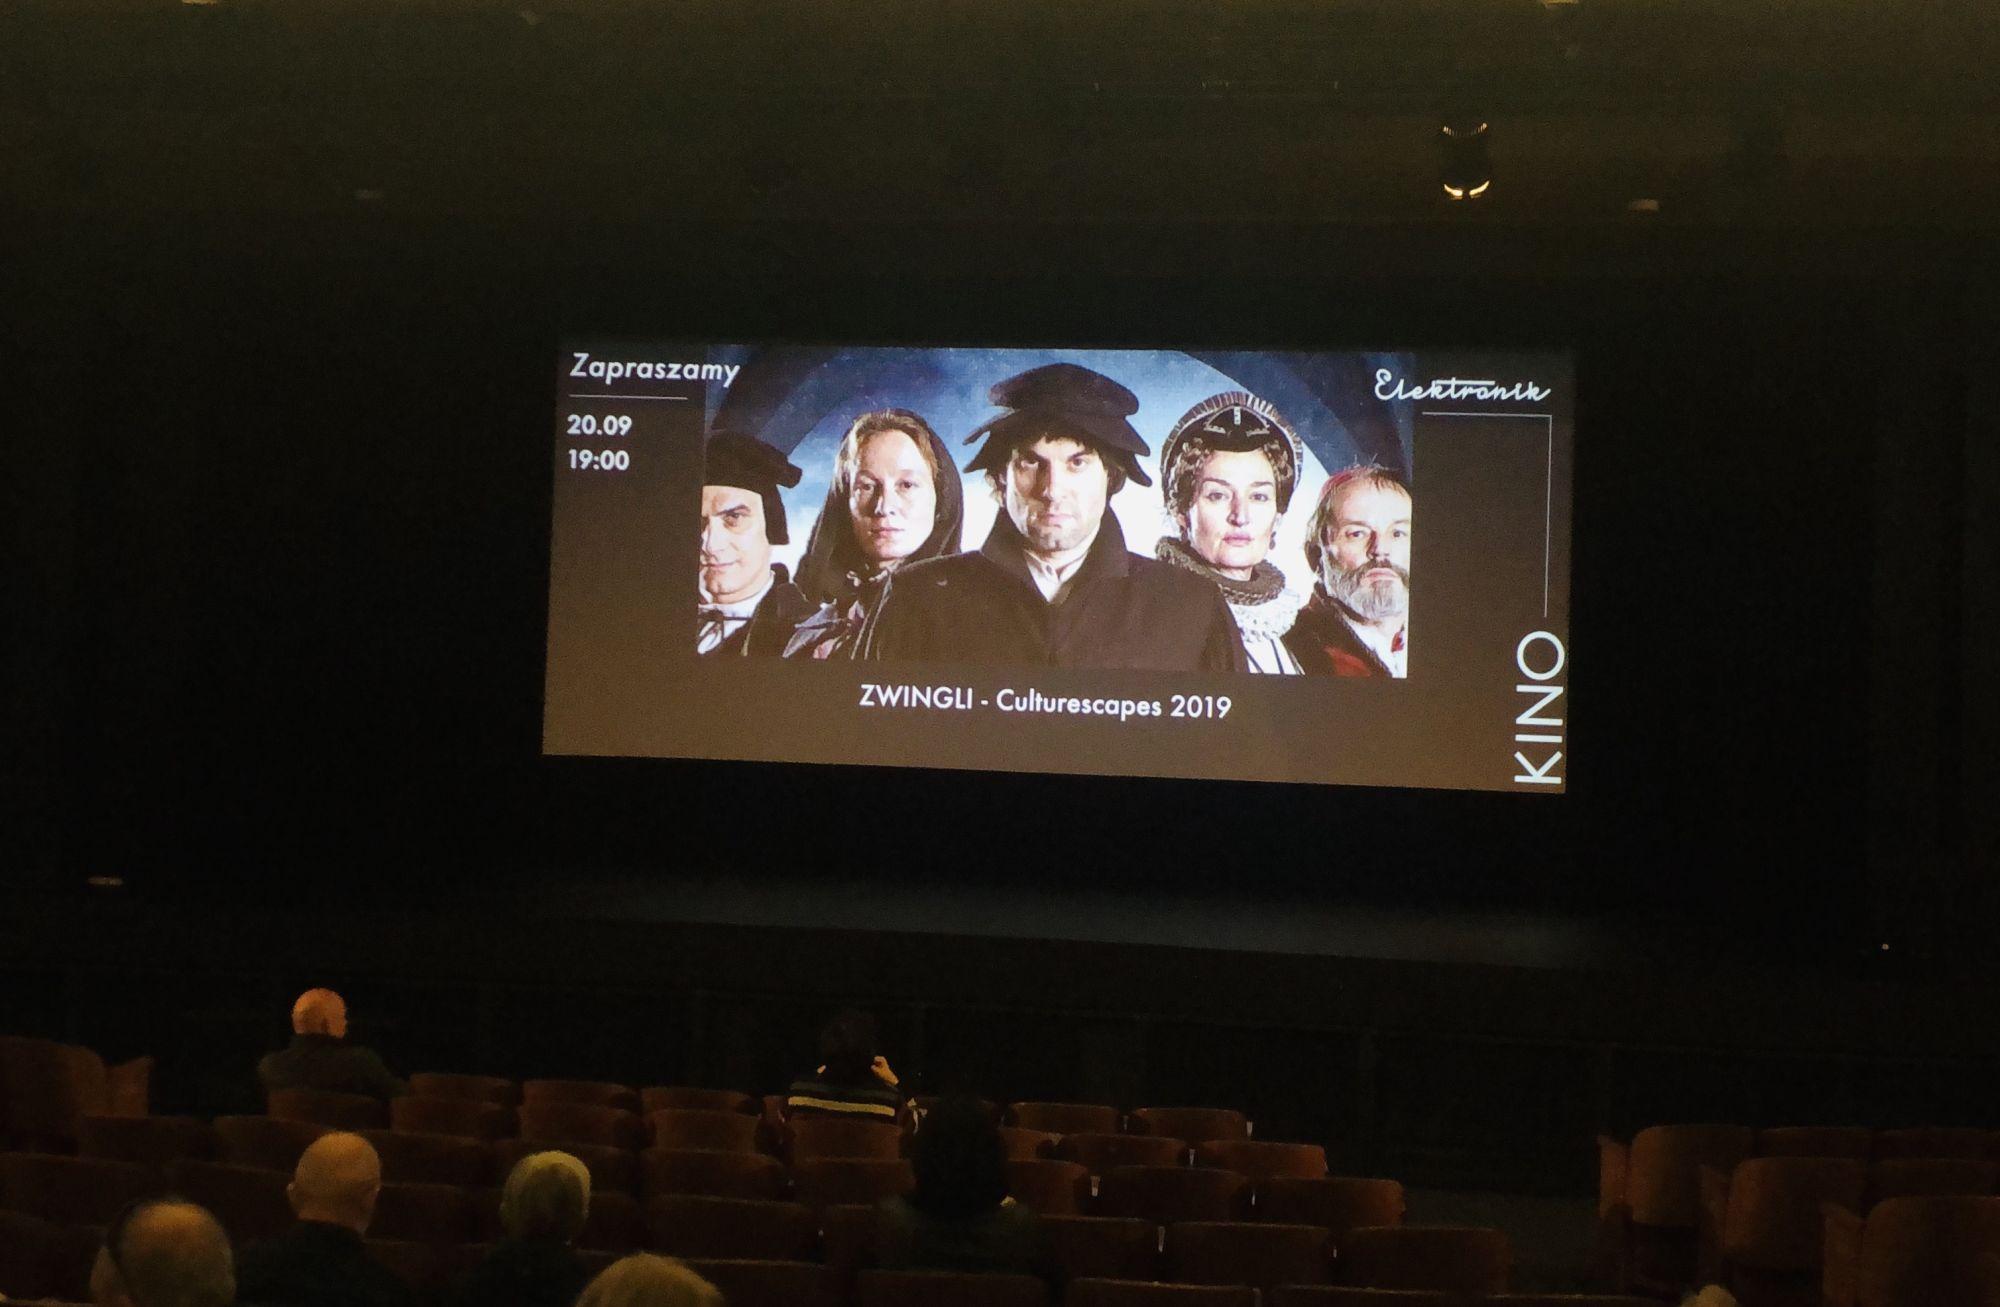 projekcja filmu Zwingli w kinie Elektronik